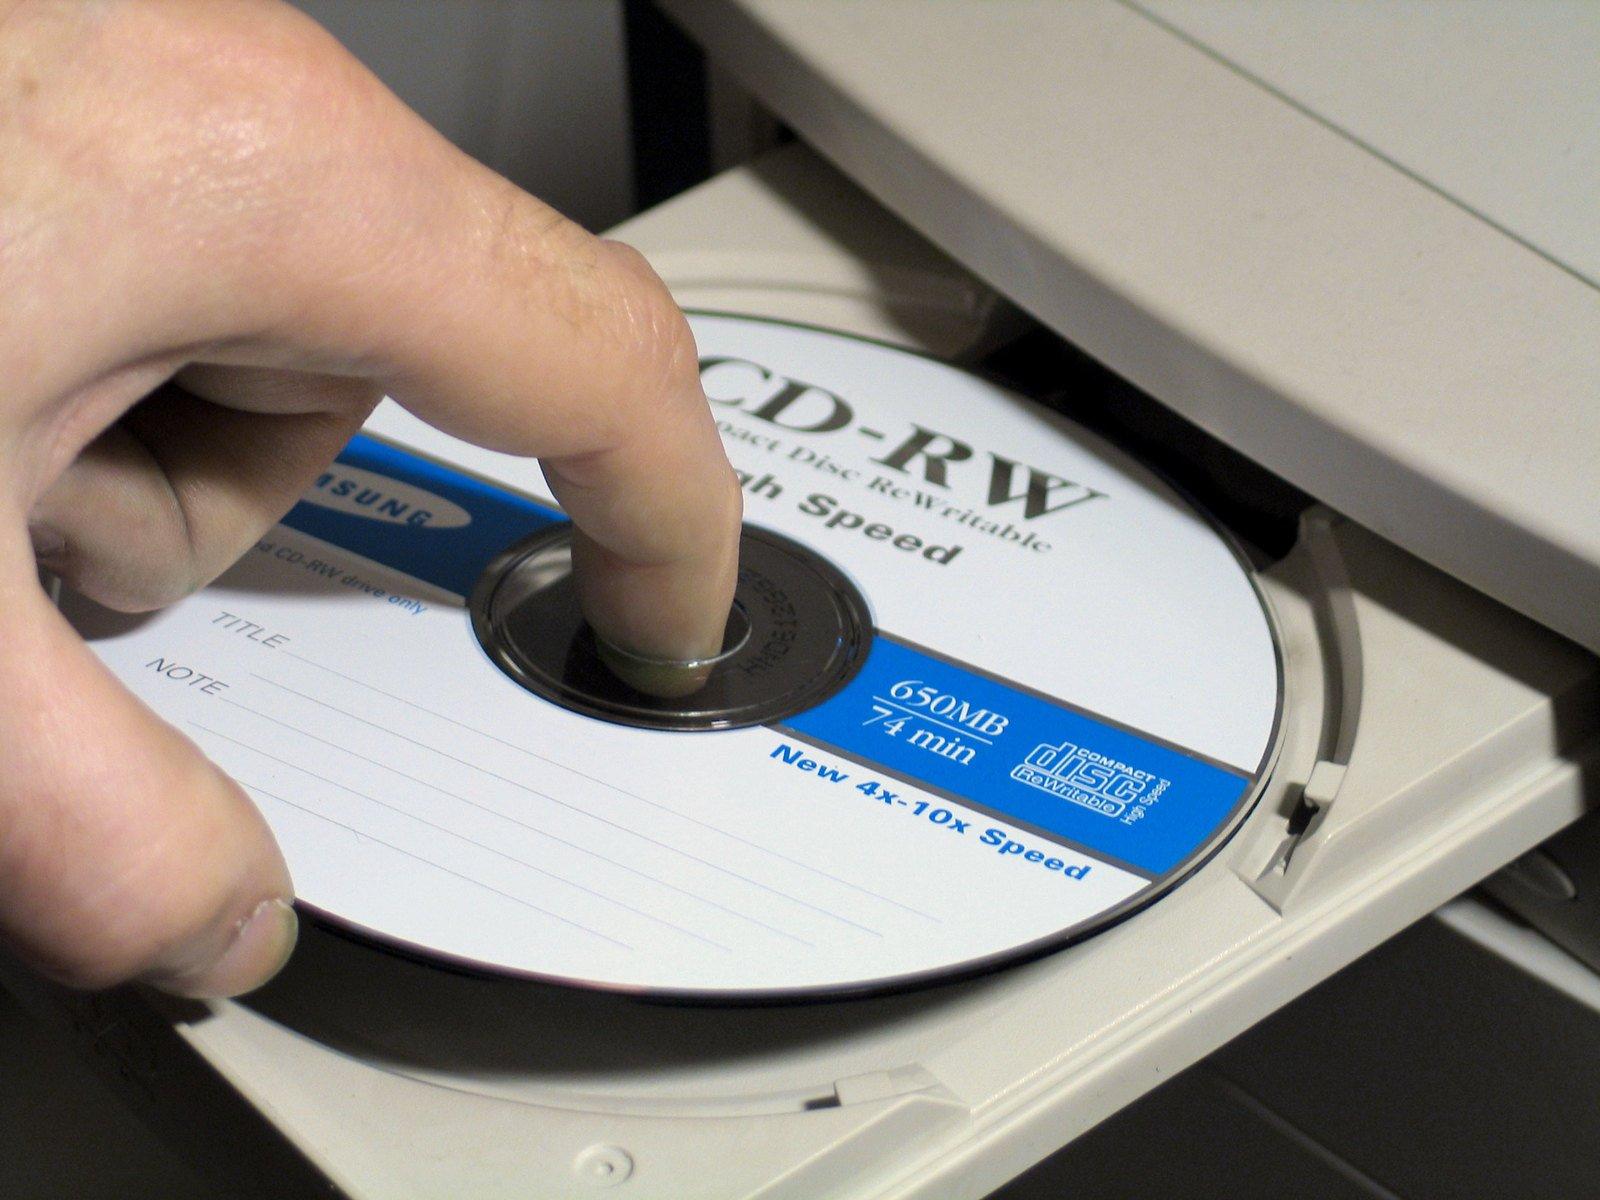 Free Cd Rom Cd Rw Hardware Software Computer Equipment